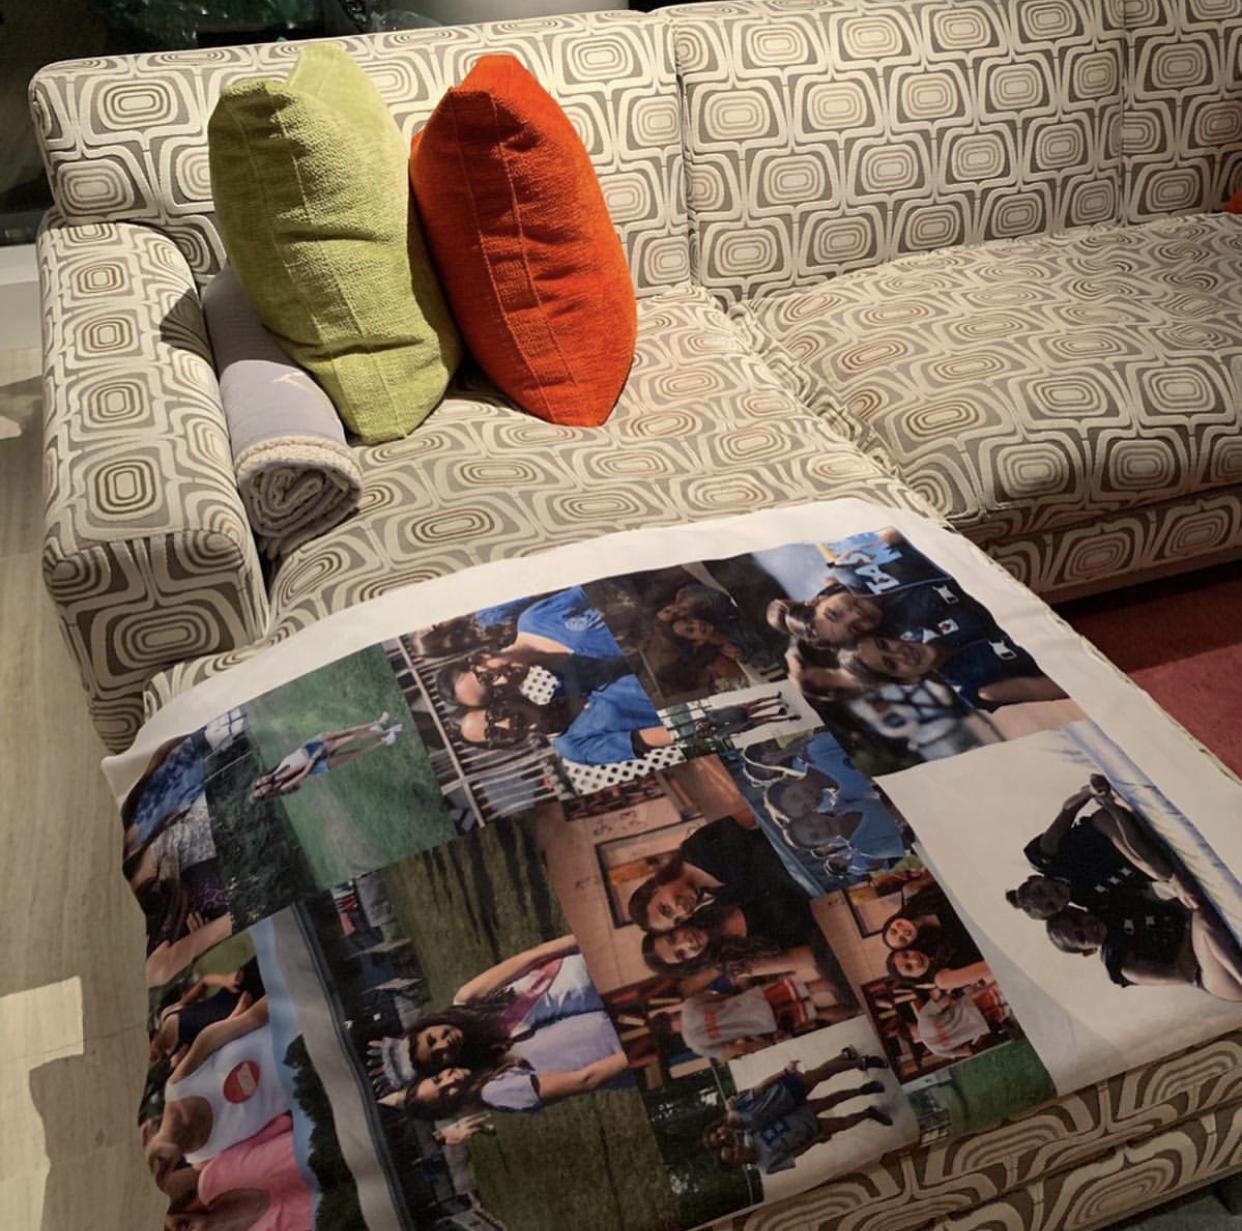 Blanket.jpeg